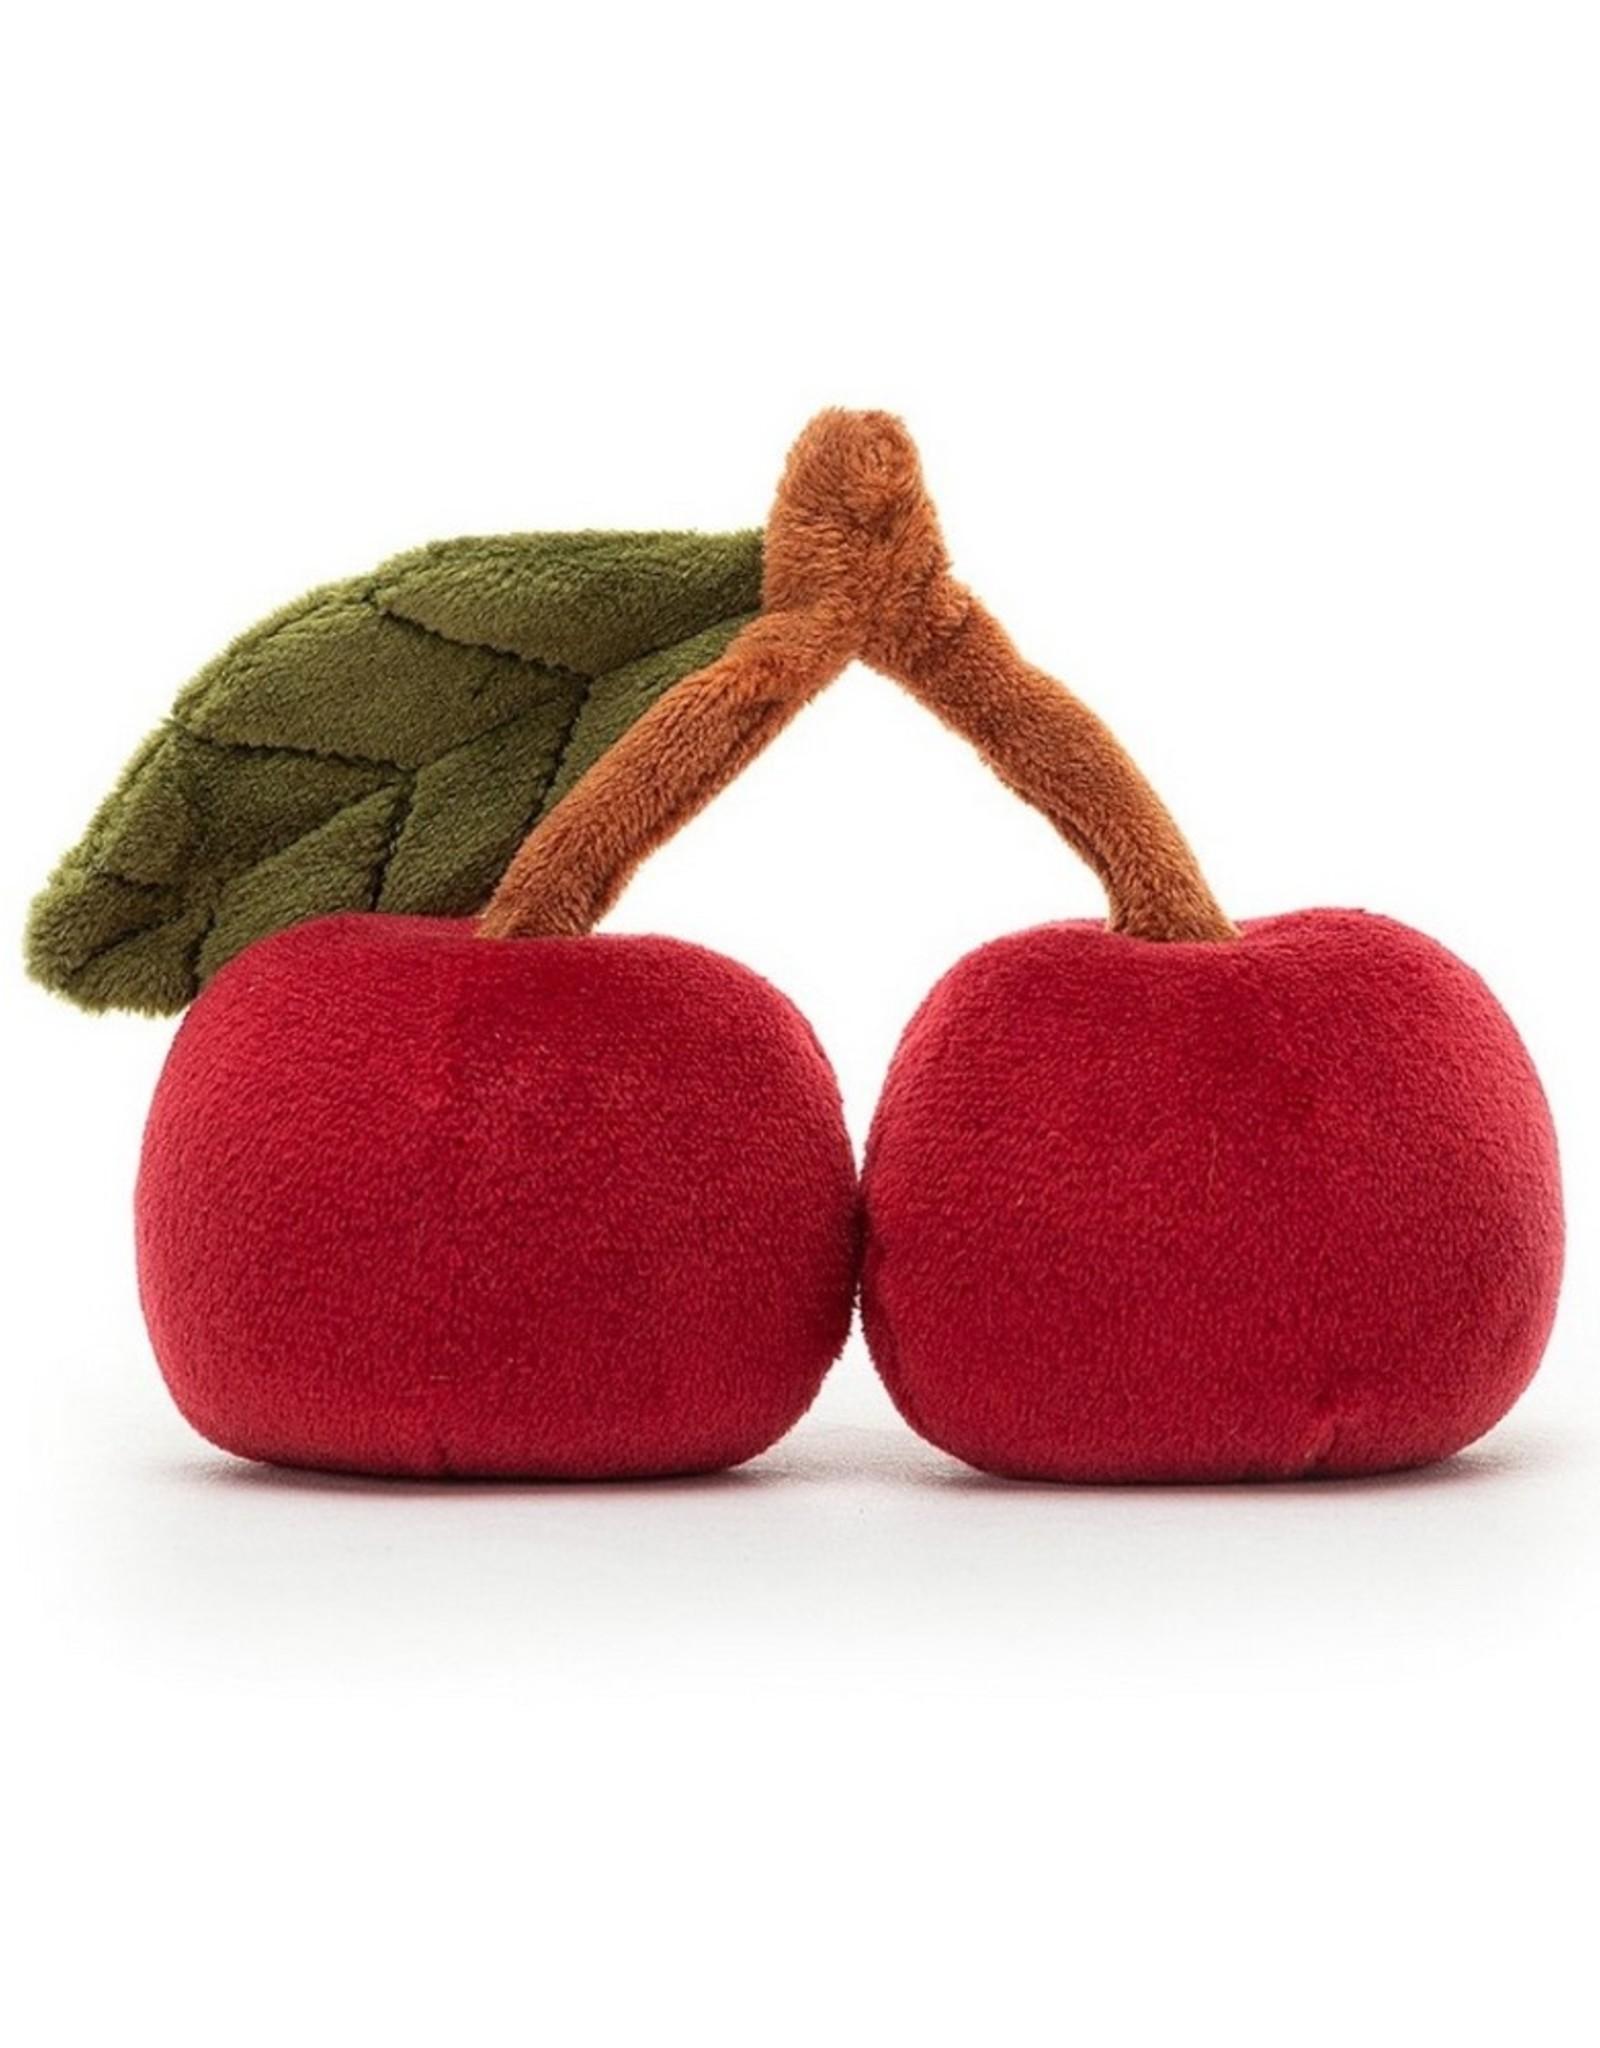 Jellycat Knuffel Fabulous Cherry